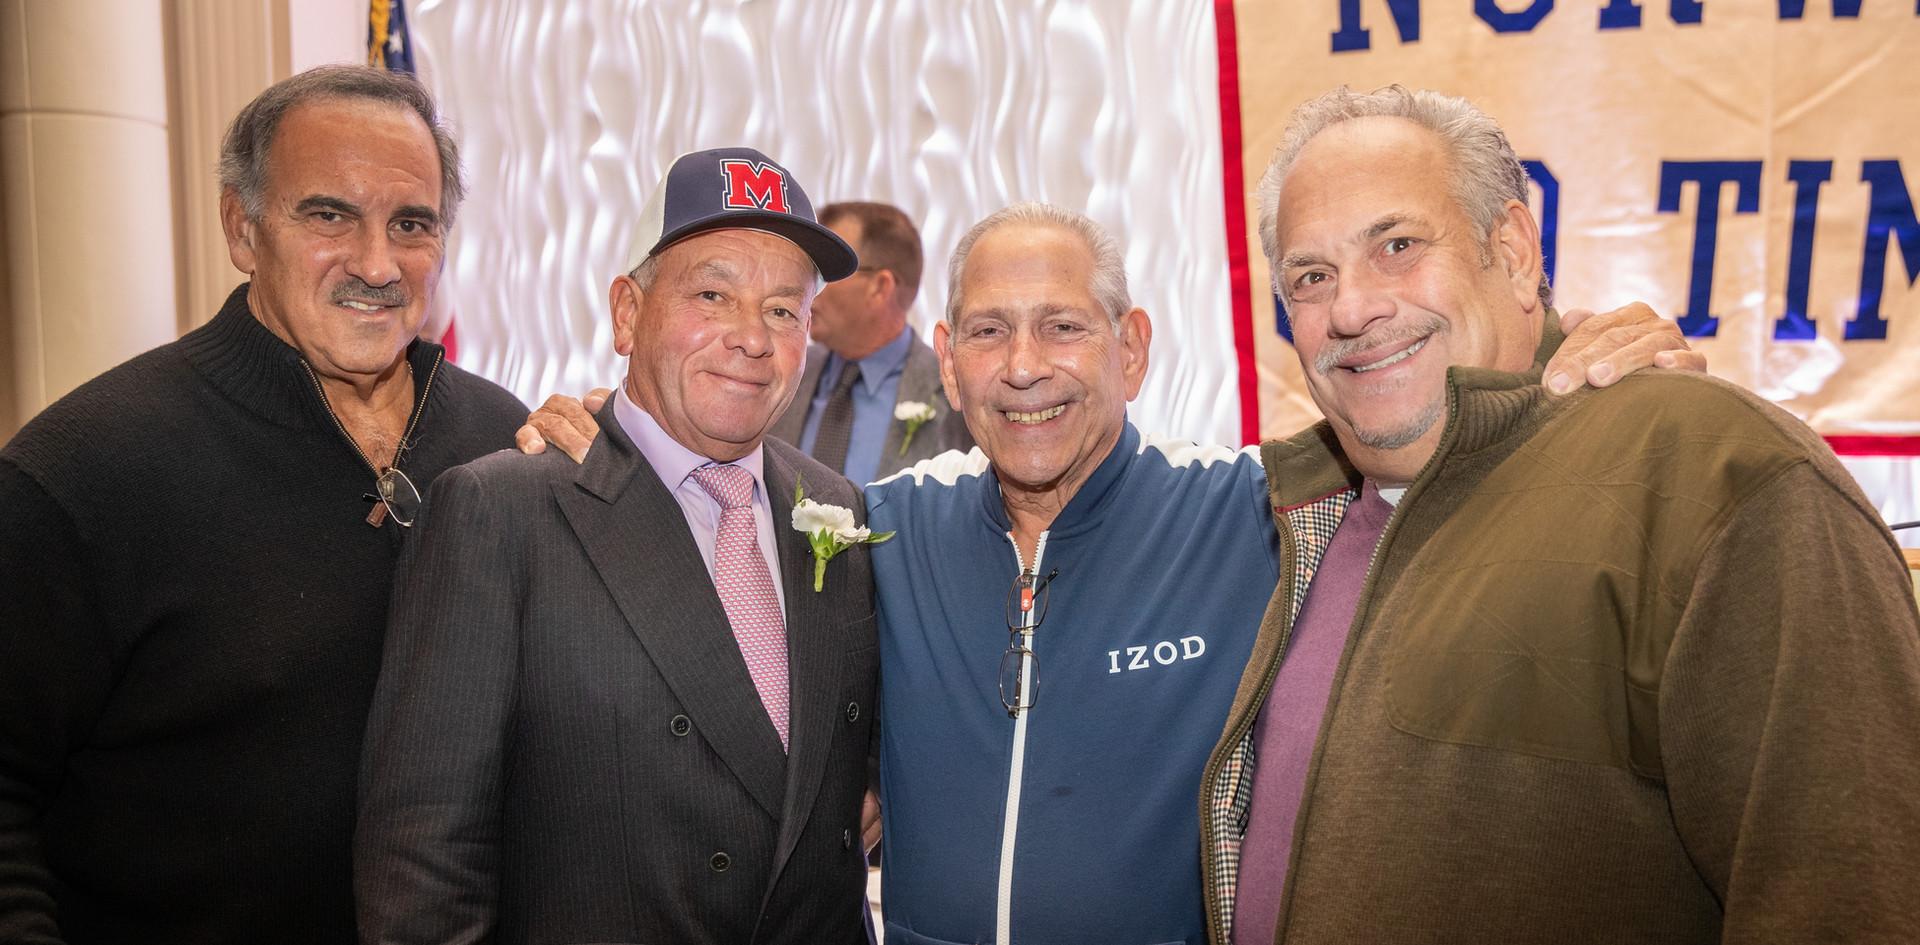 2014 honoree Rudy Gisolfi, 2019 honoree Felix Rodriquez, Richie Galbo, and Mike DiDio.  (photo by Josh Molaver)